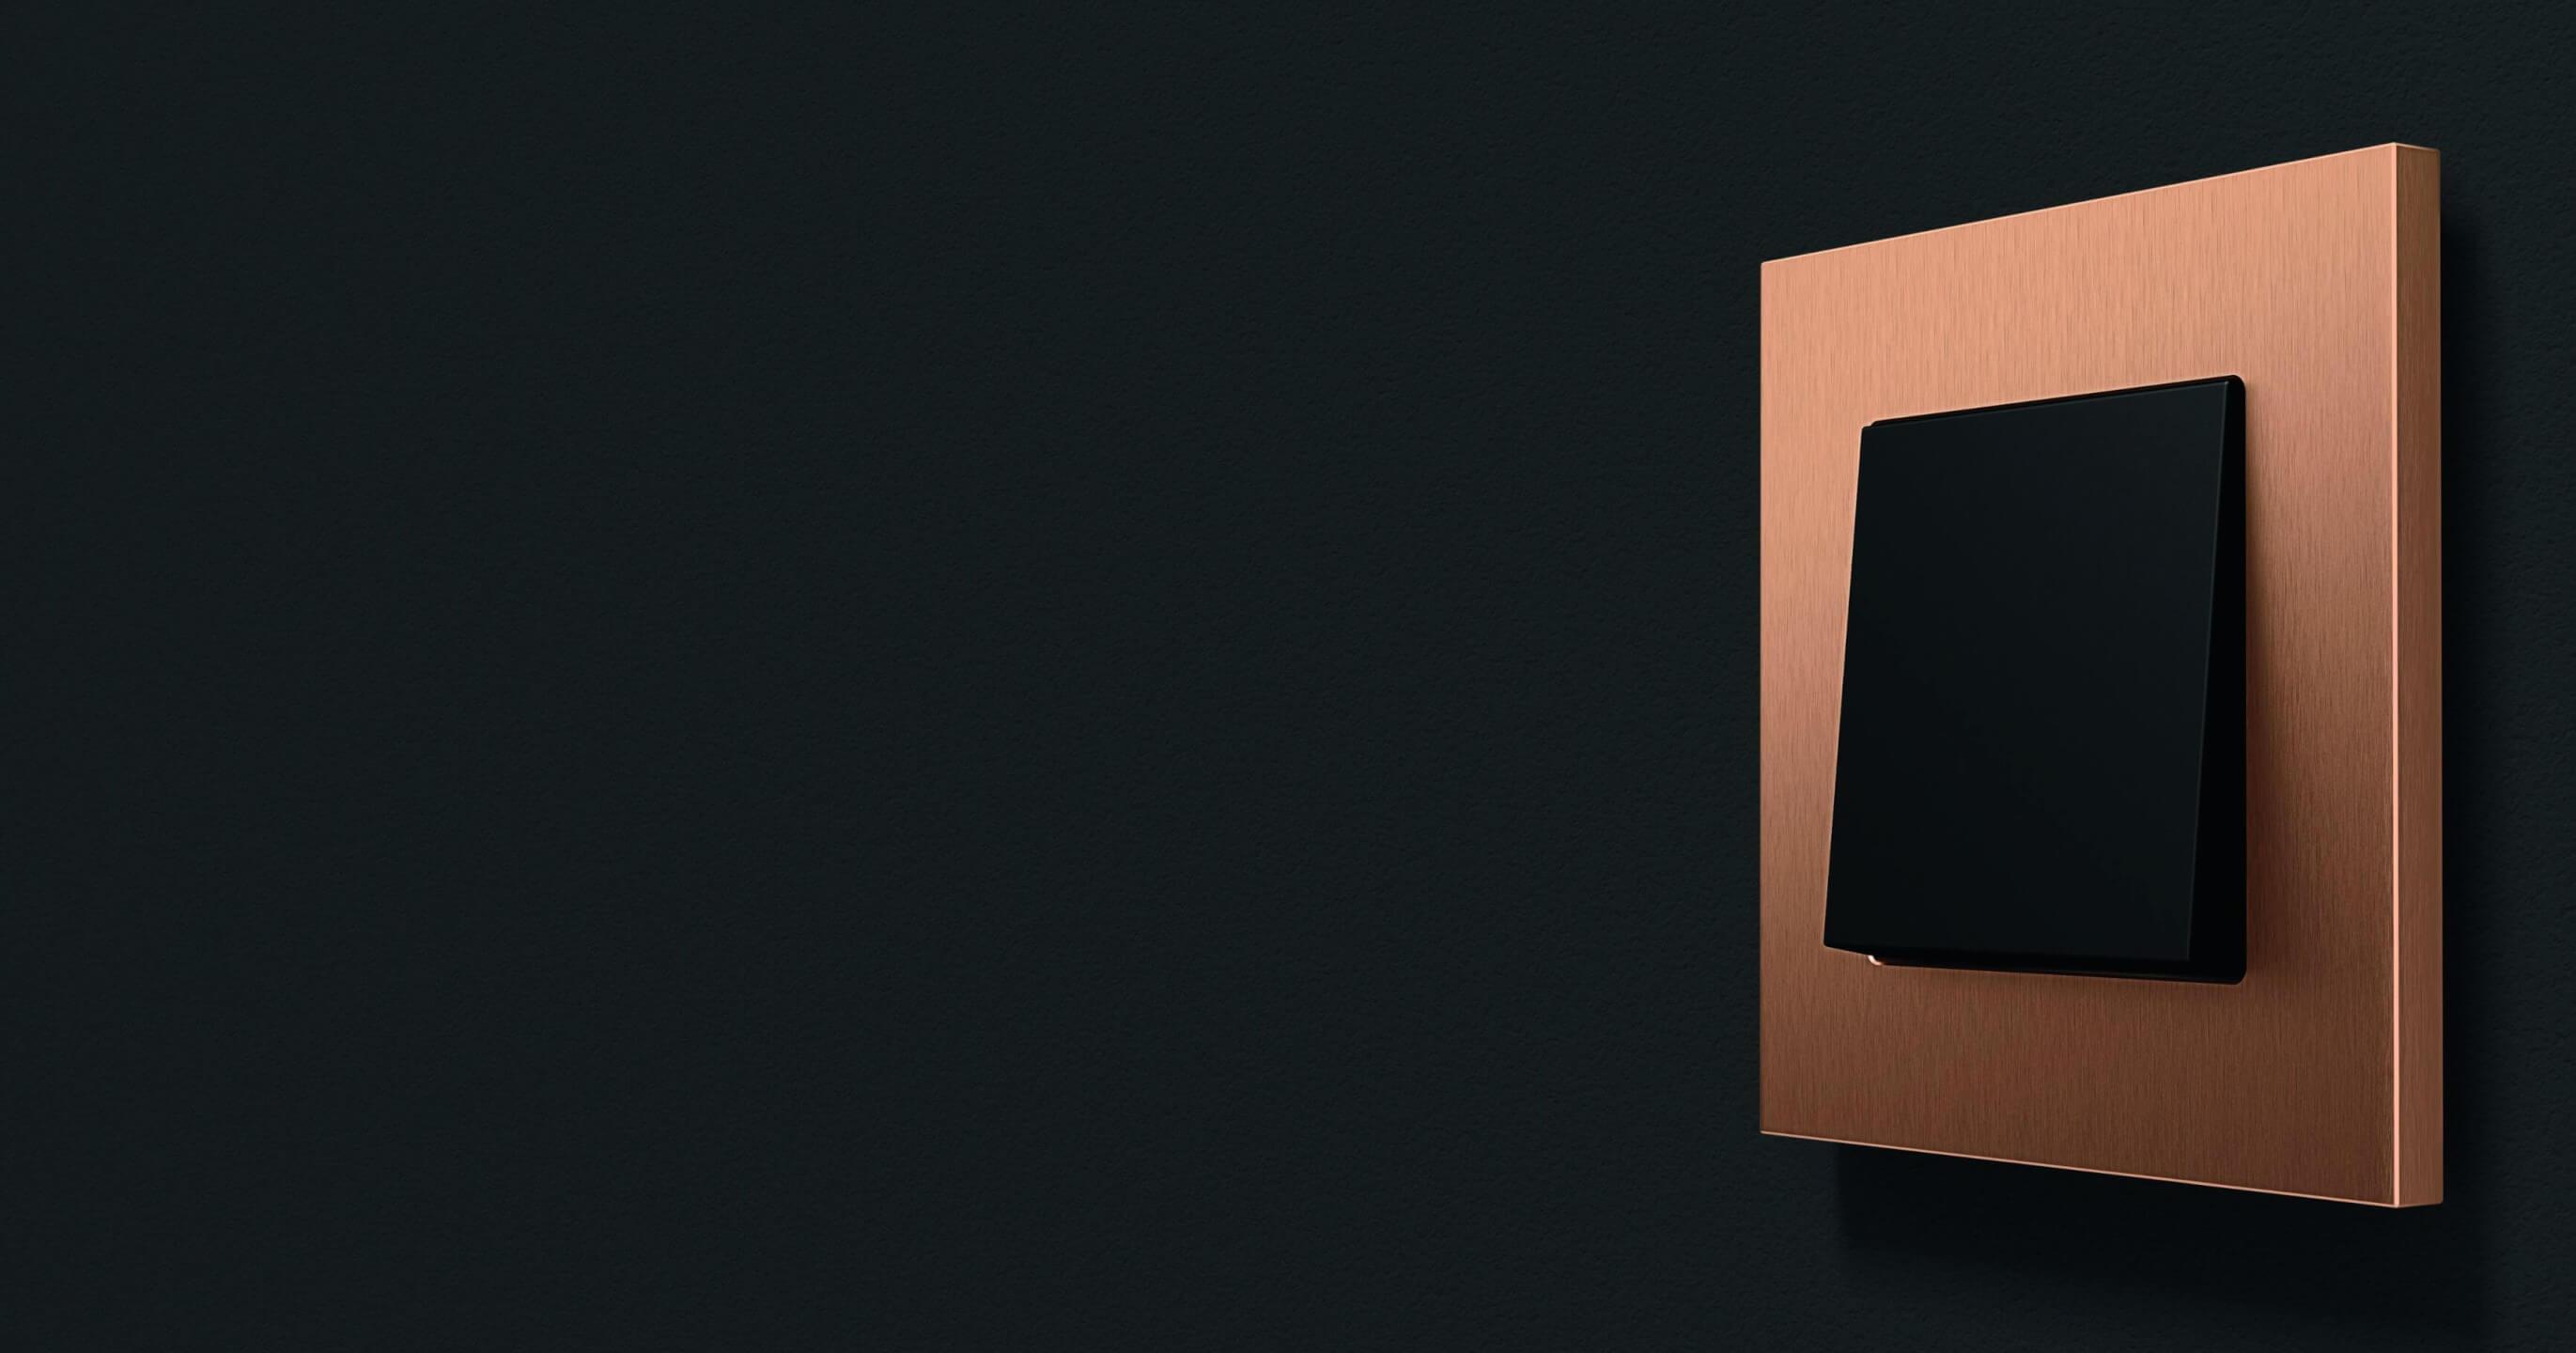 B2C Website Gira Esprit Glas Produktkachel